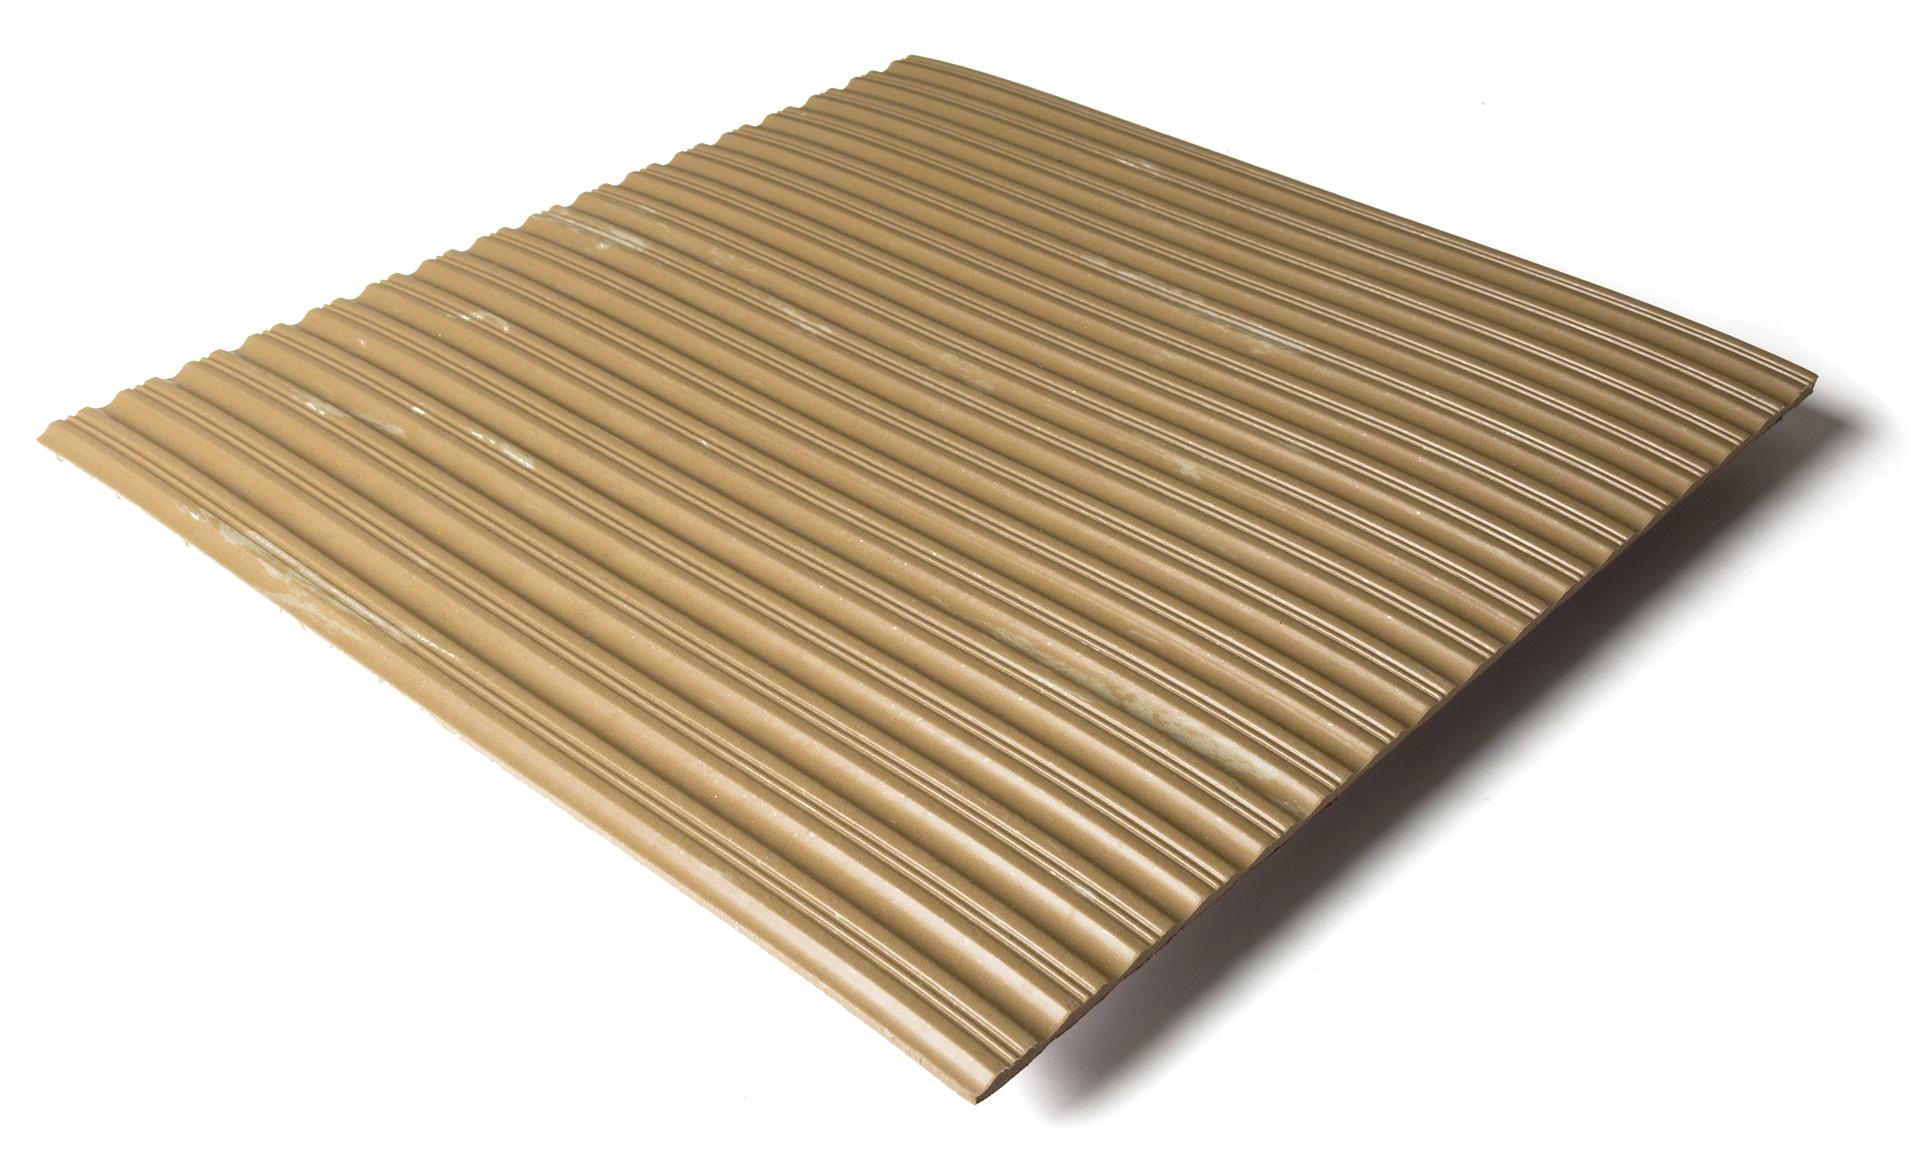 Standard transit flooring in marbled tan, ribbed